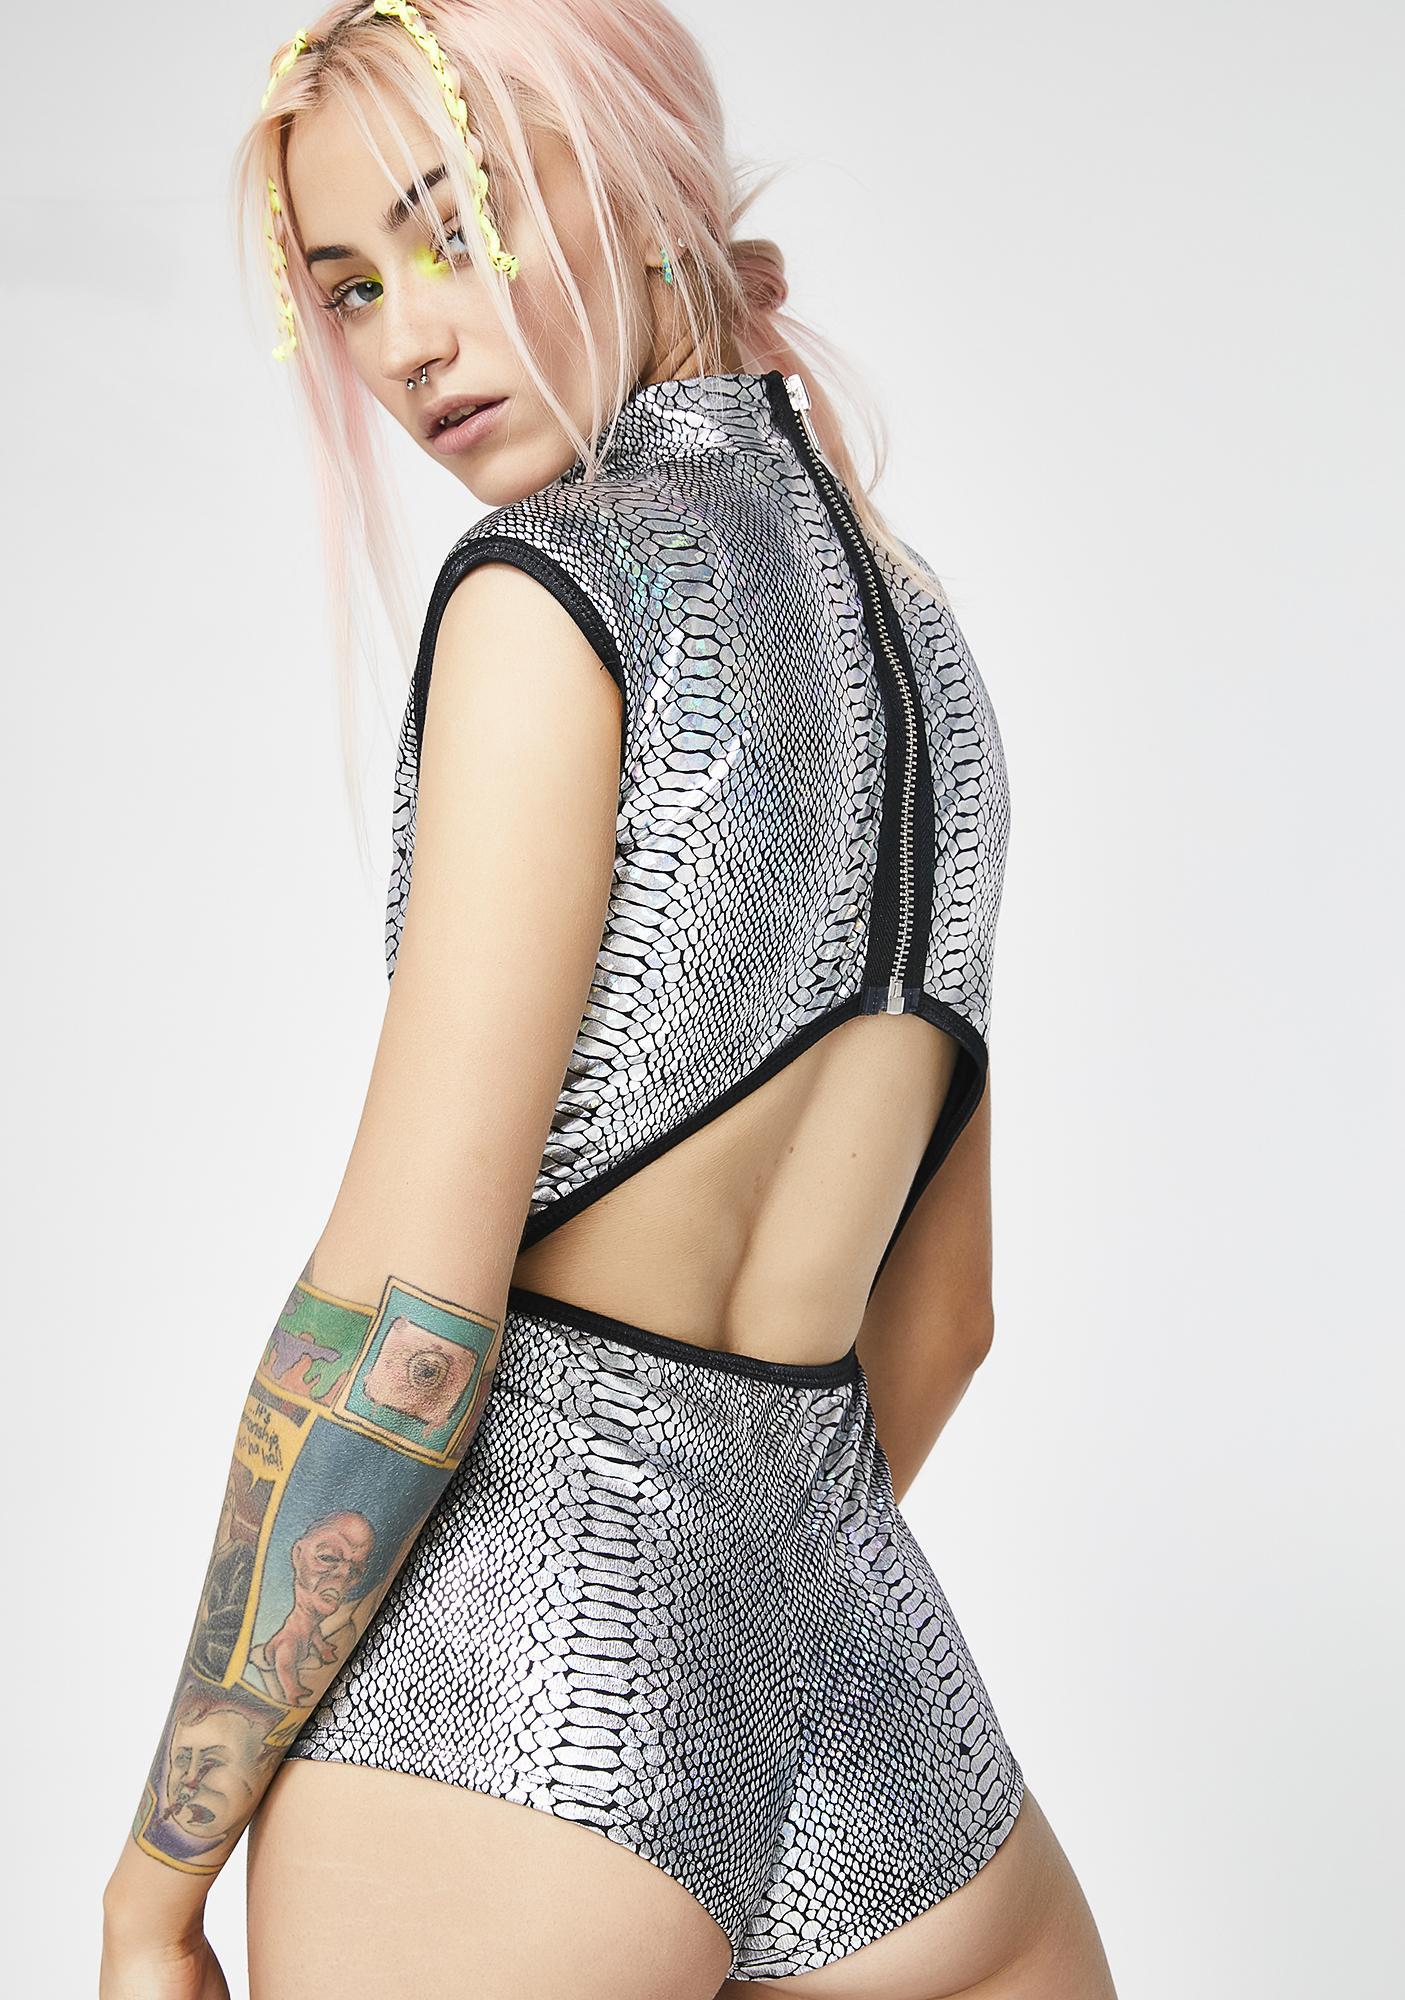 Club Exx Taste My Poison Hologram Bodysuit